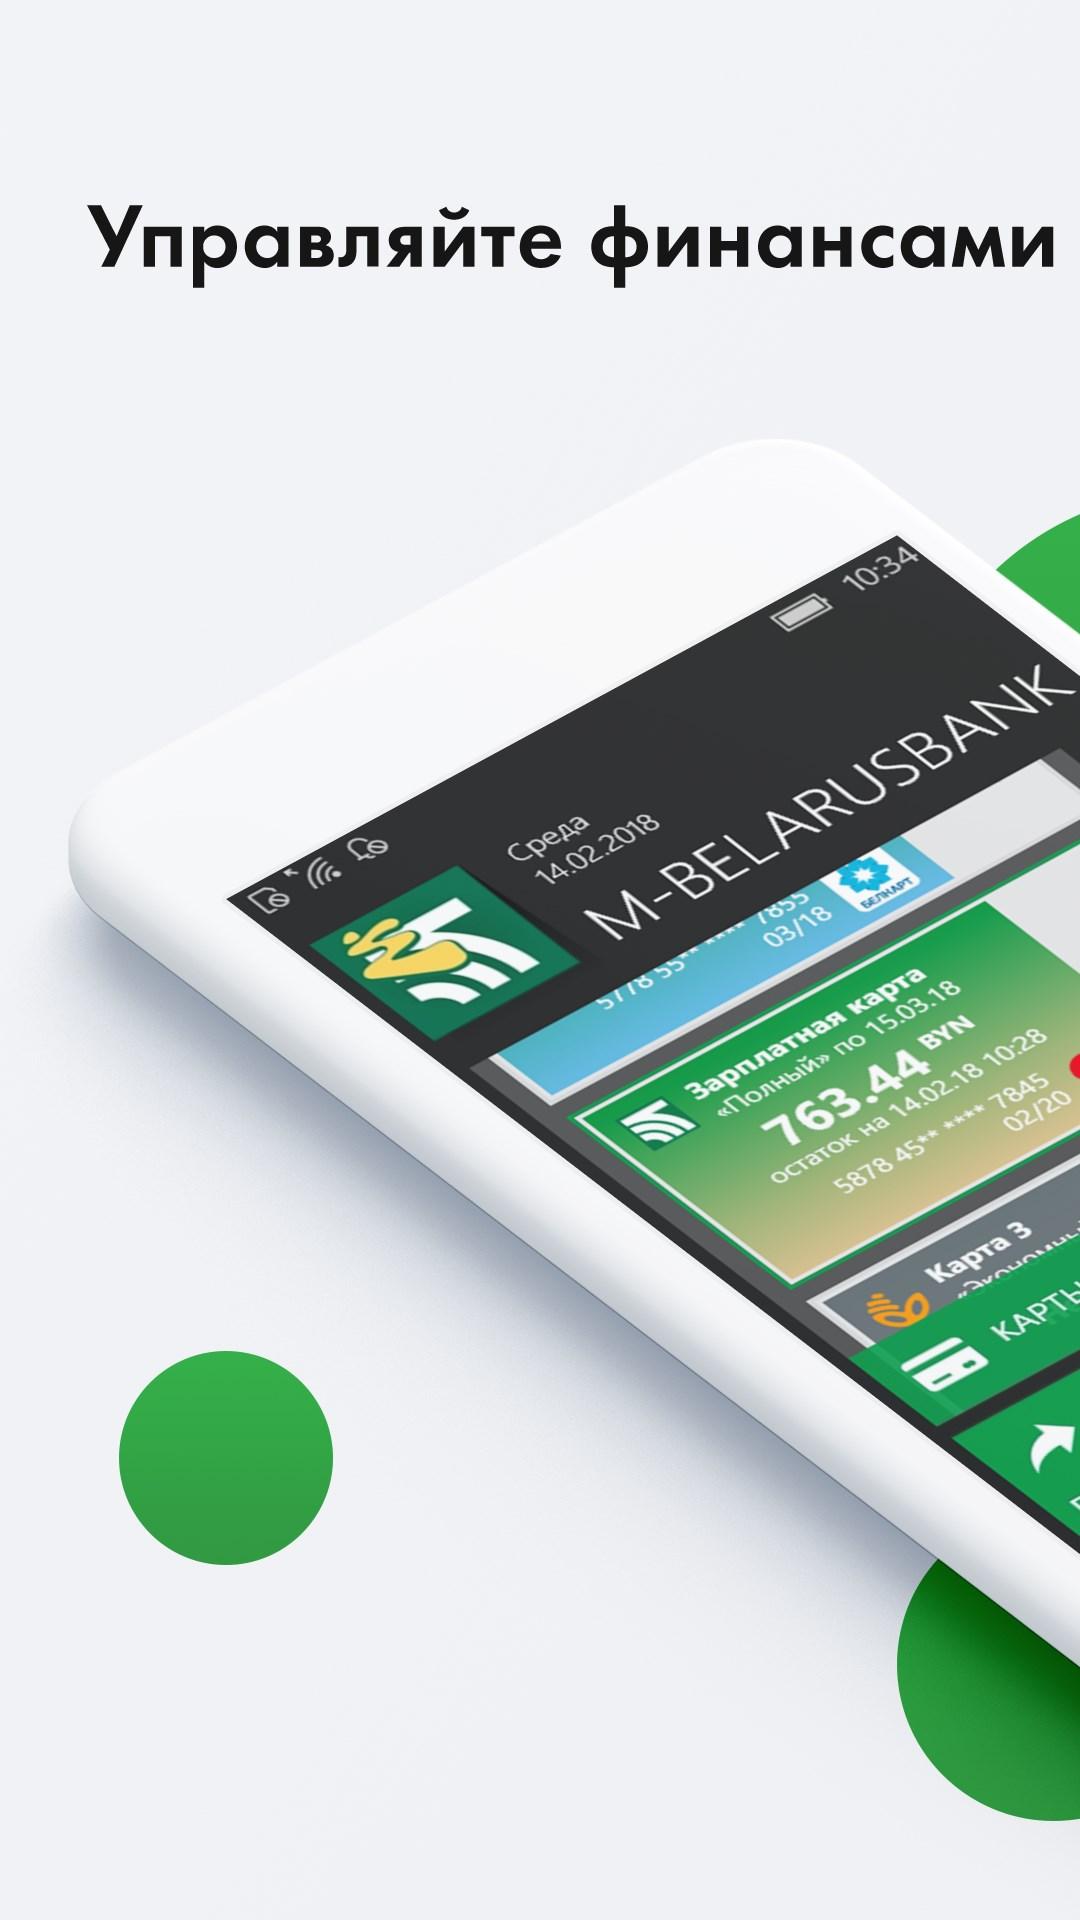 Как перевести деньги с карты на карту через интернет банкинг беларусбанк